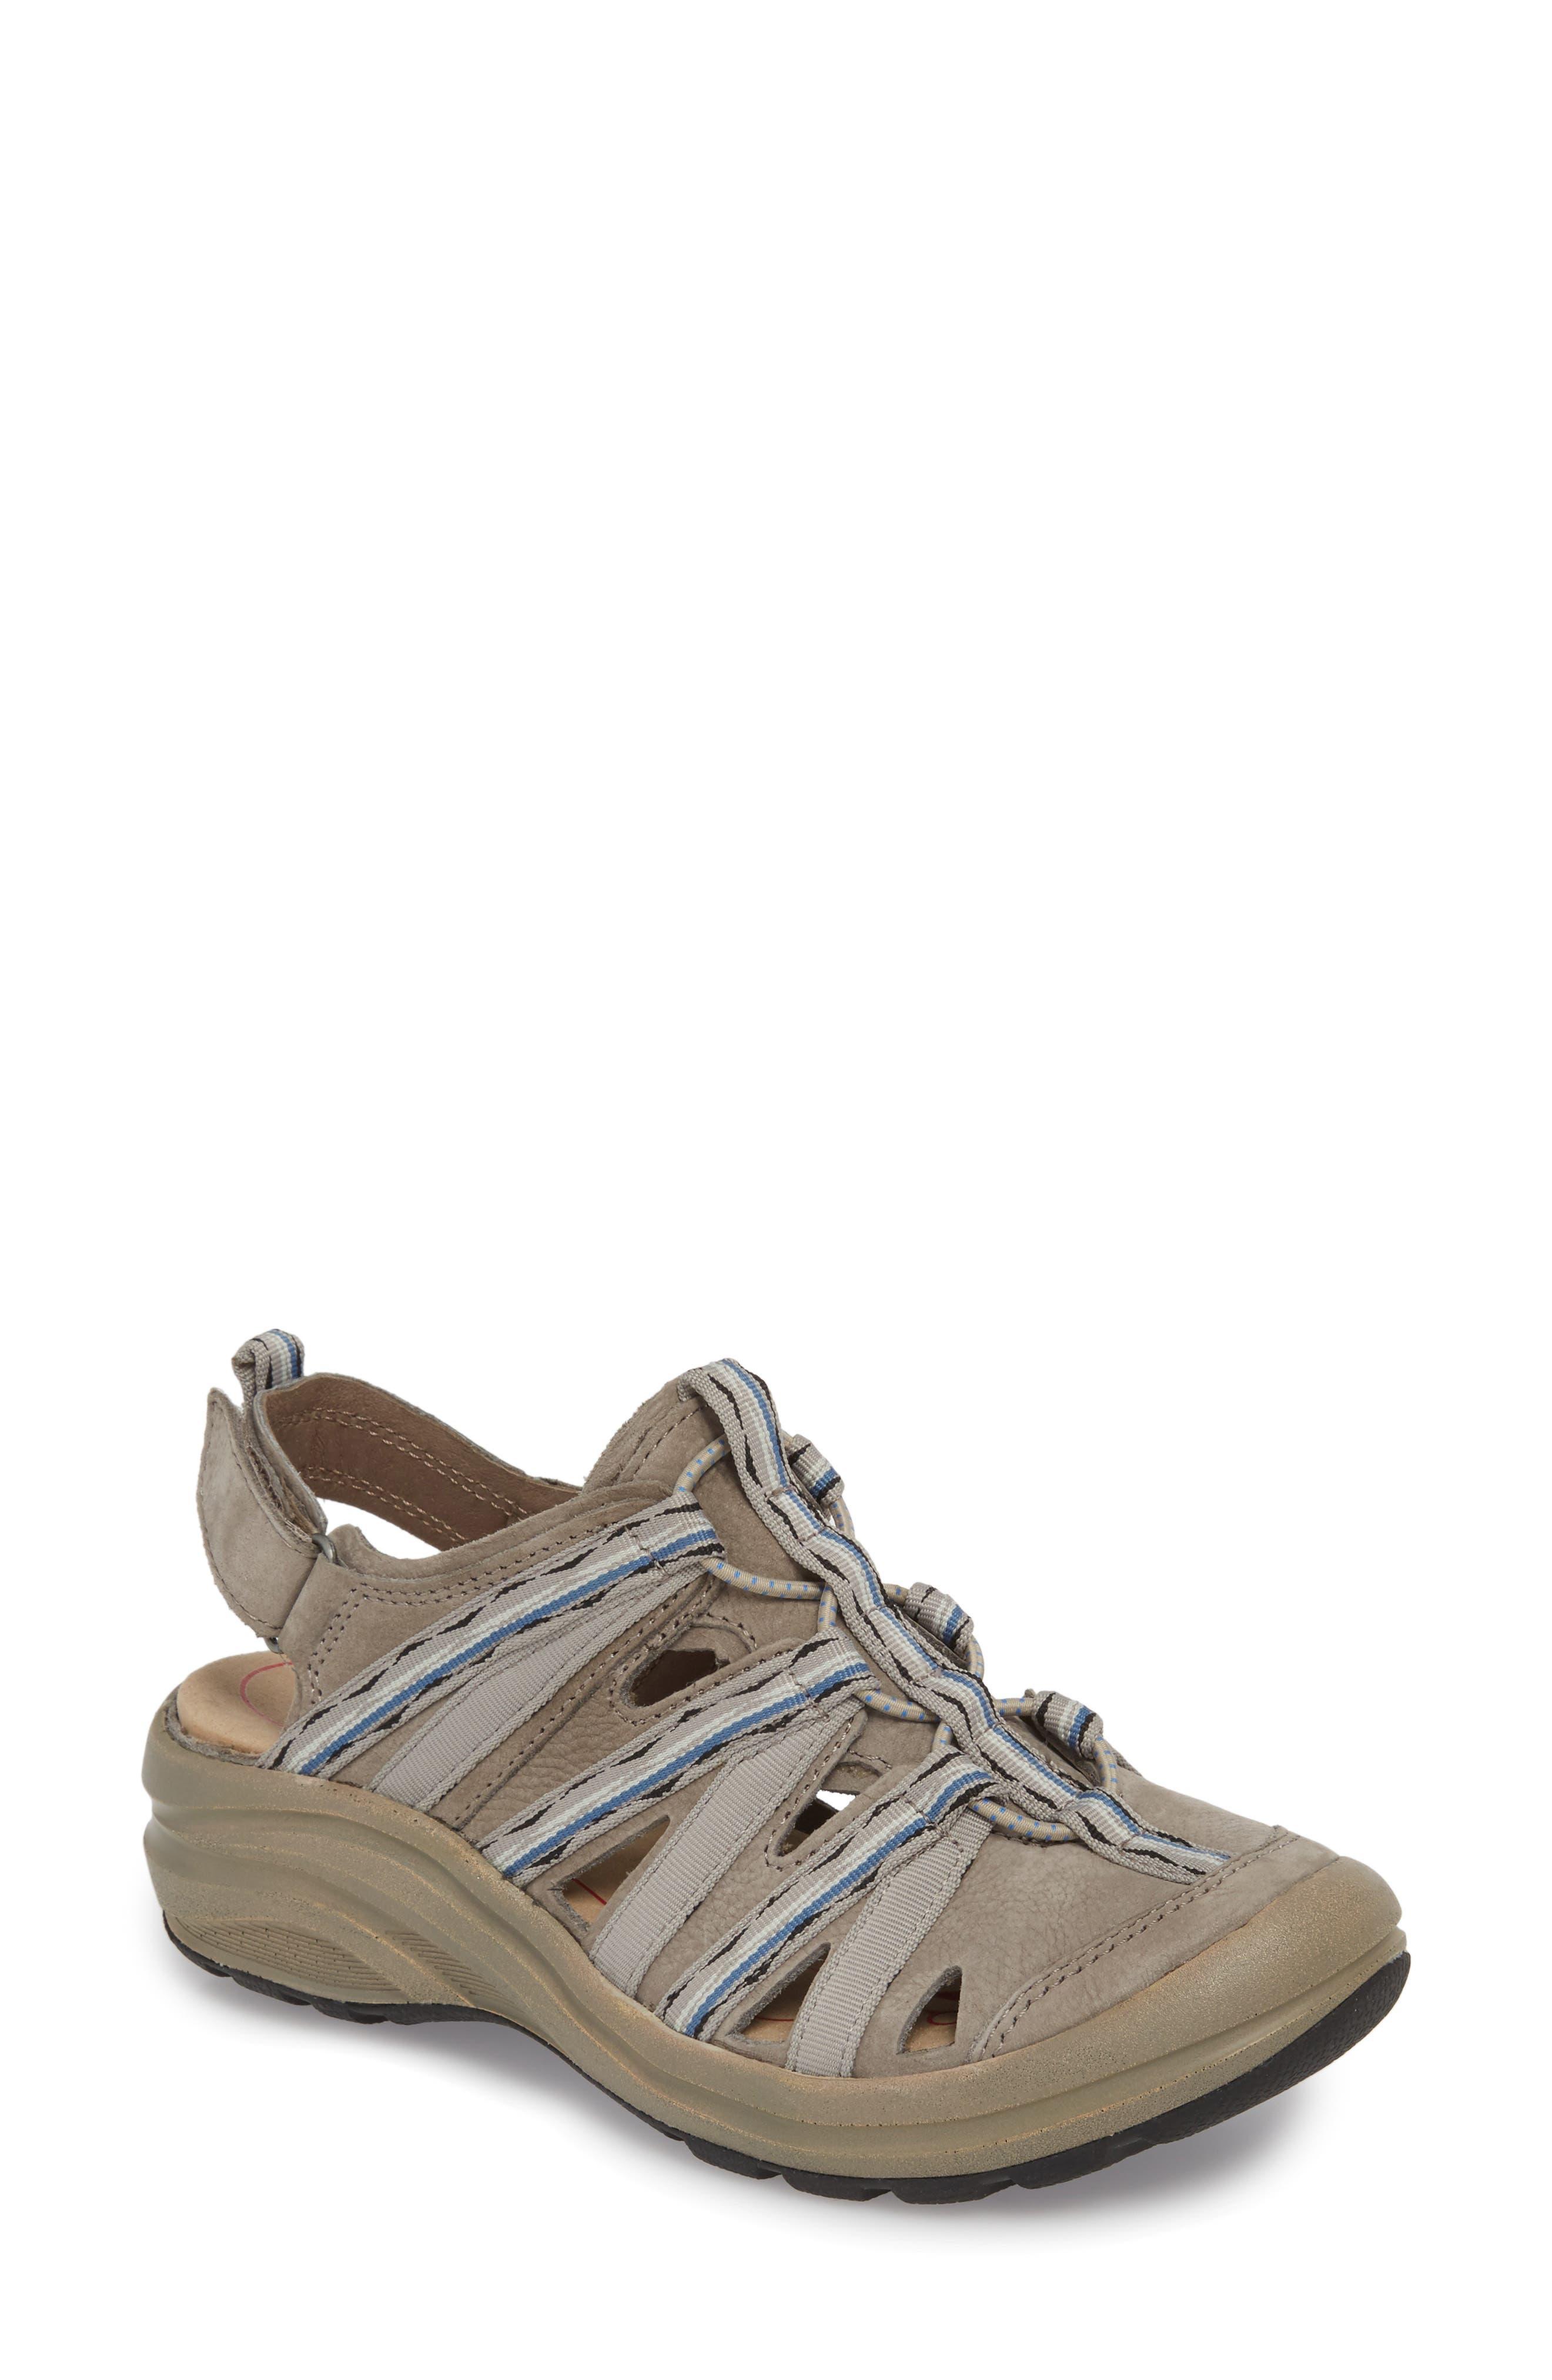 Malabar Sport Sandal,                         Main,                         color, Paper Mache Leather